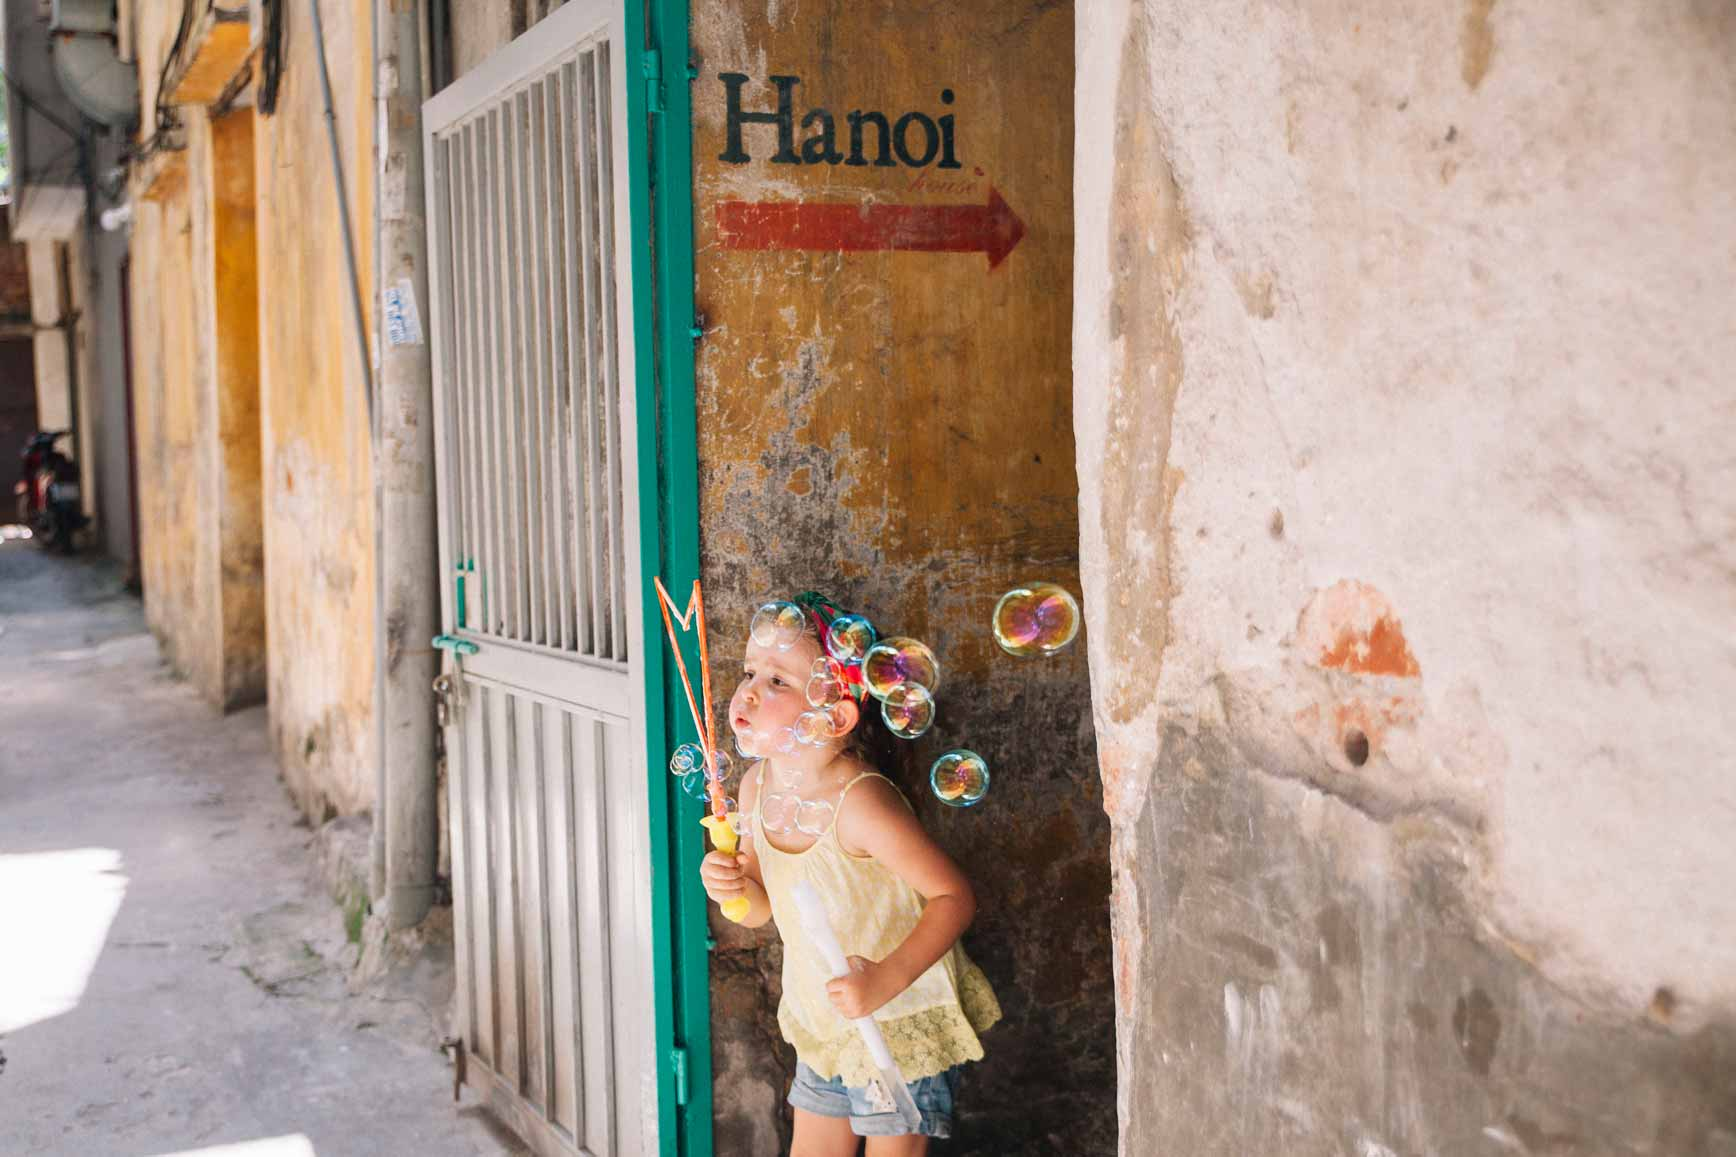 Hanoi_199